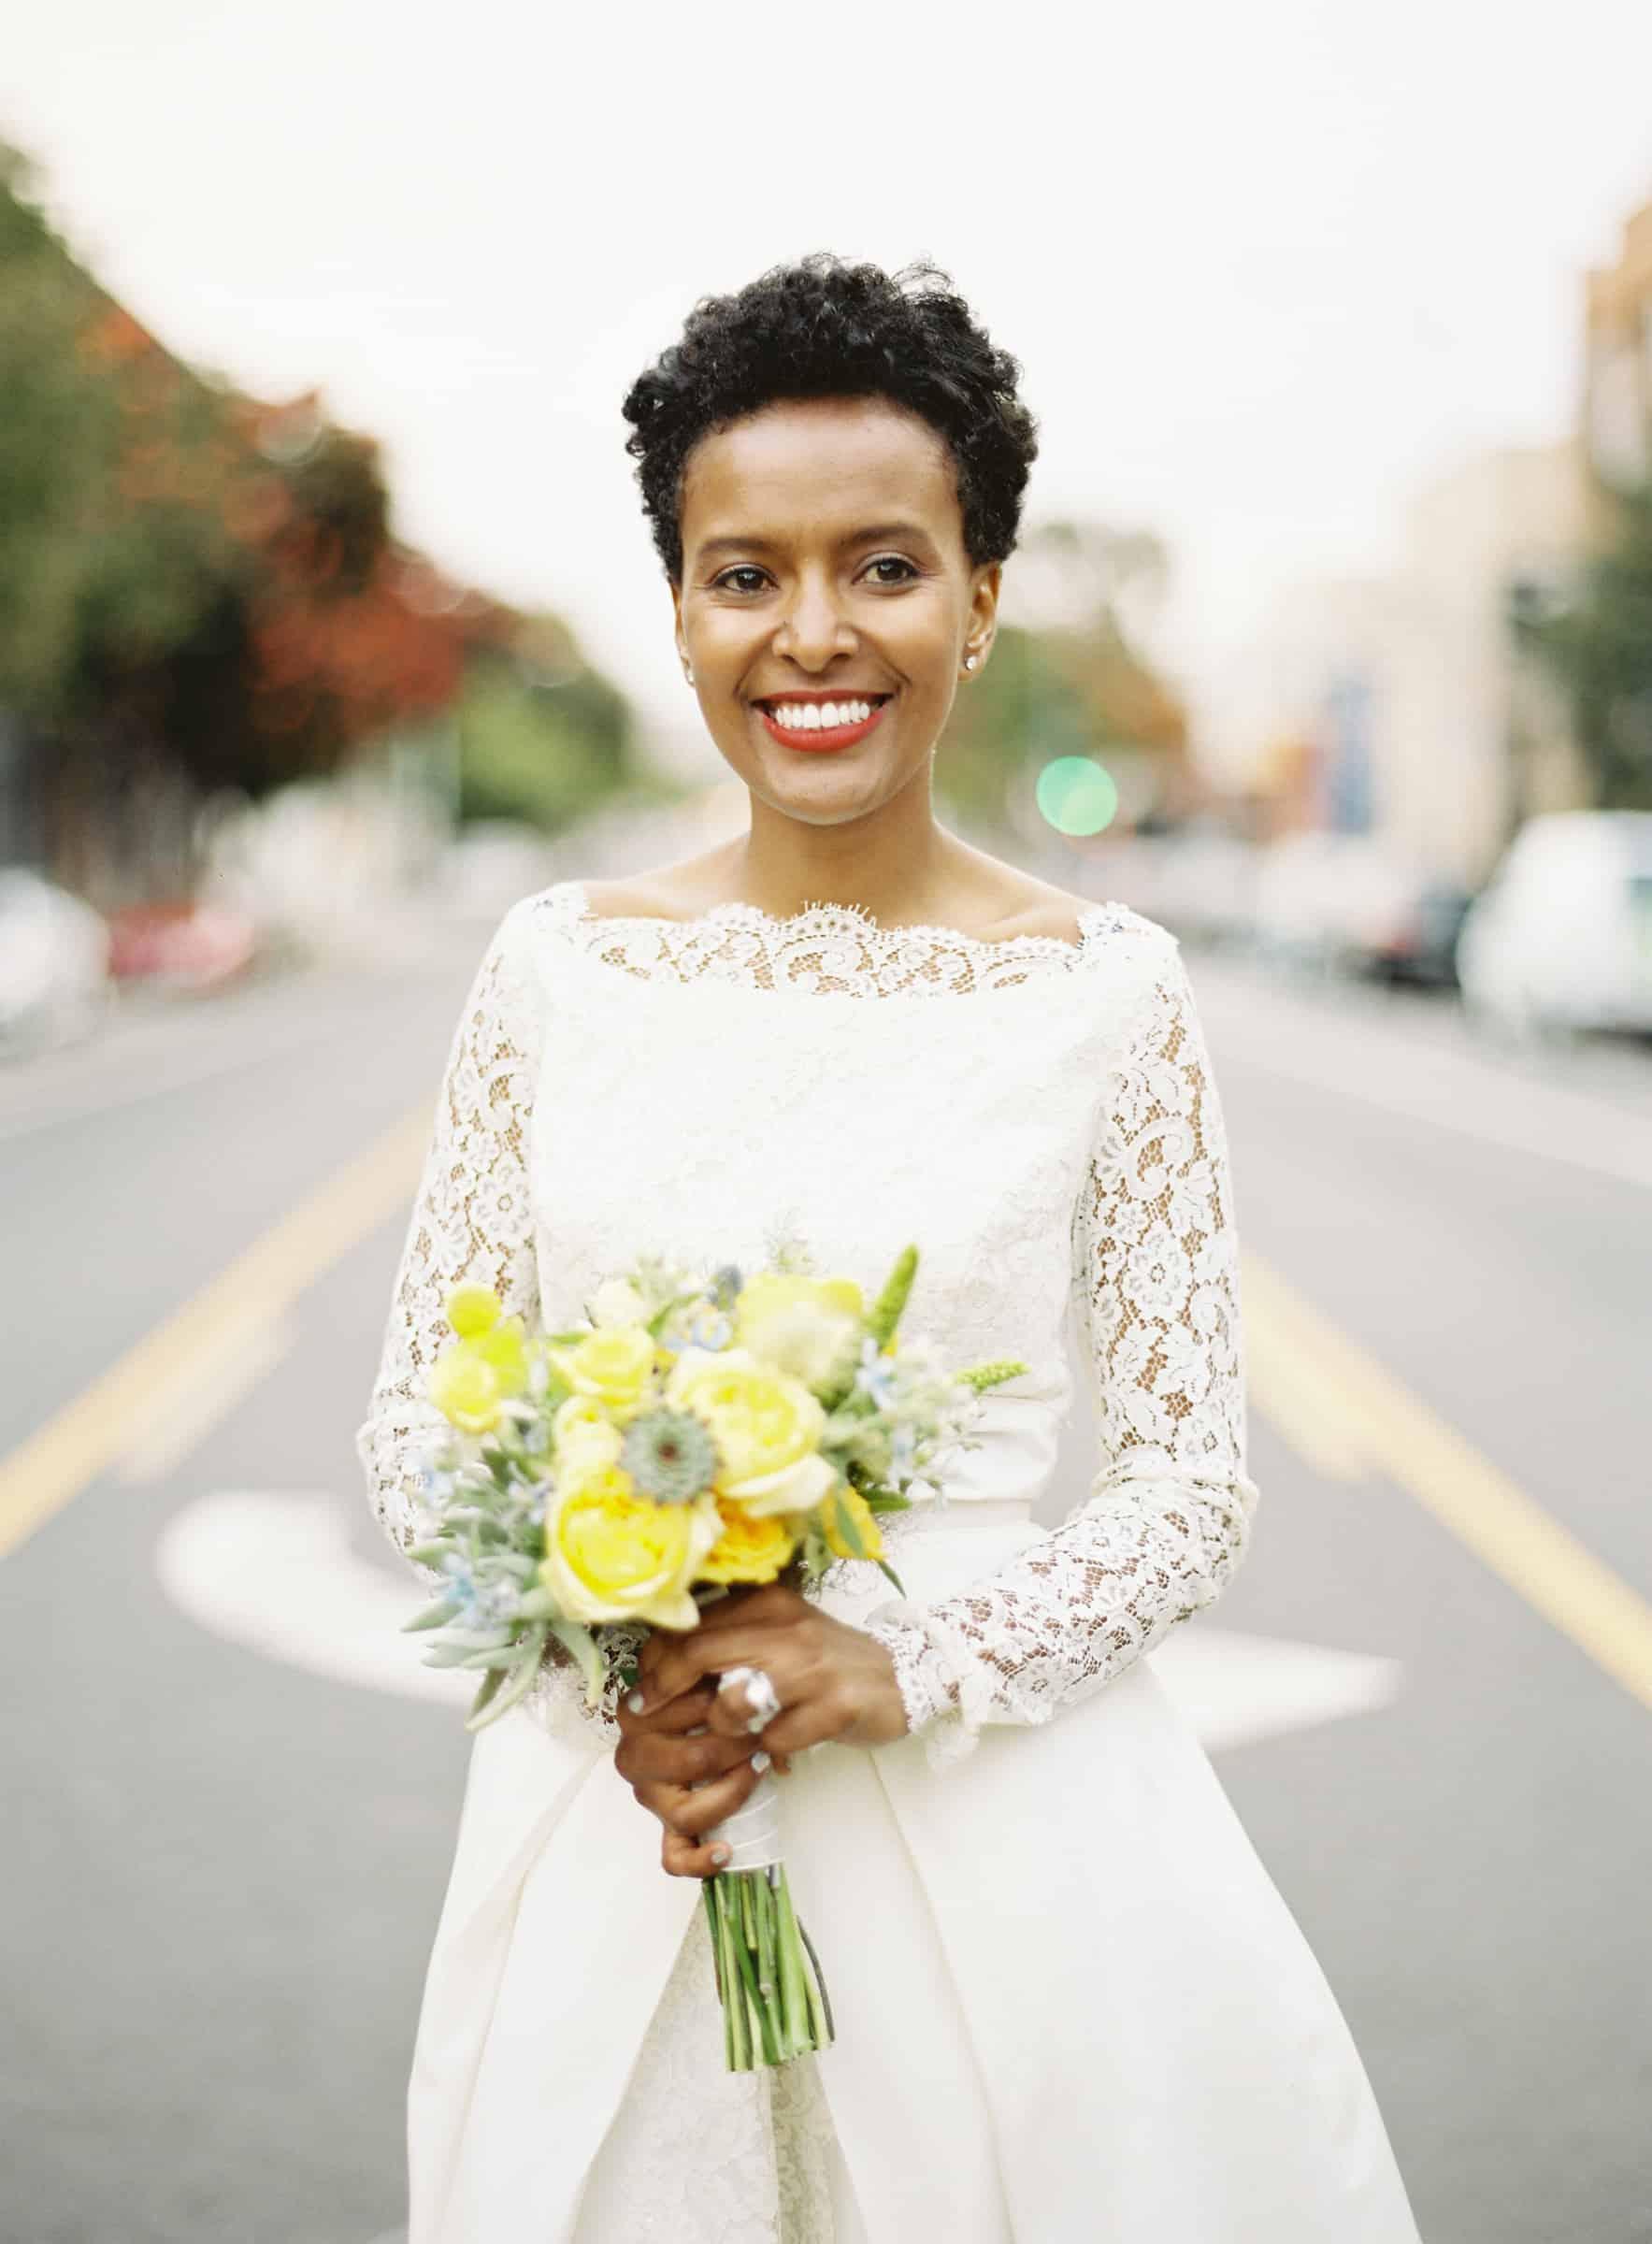 African american bride posing in the city street